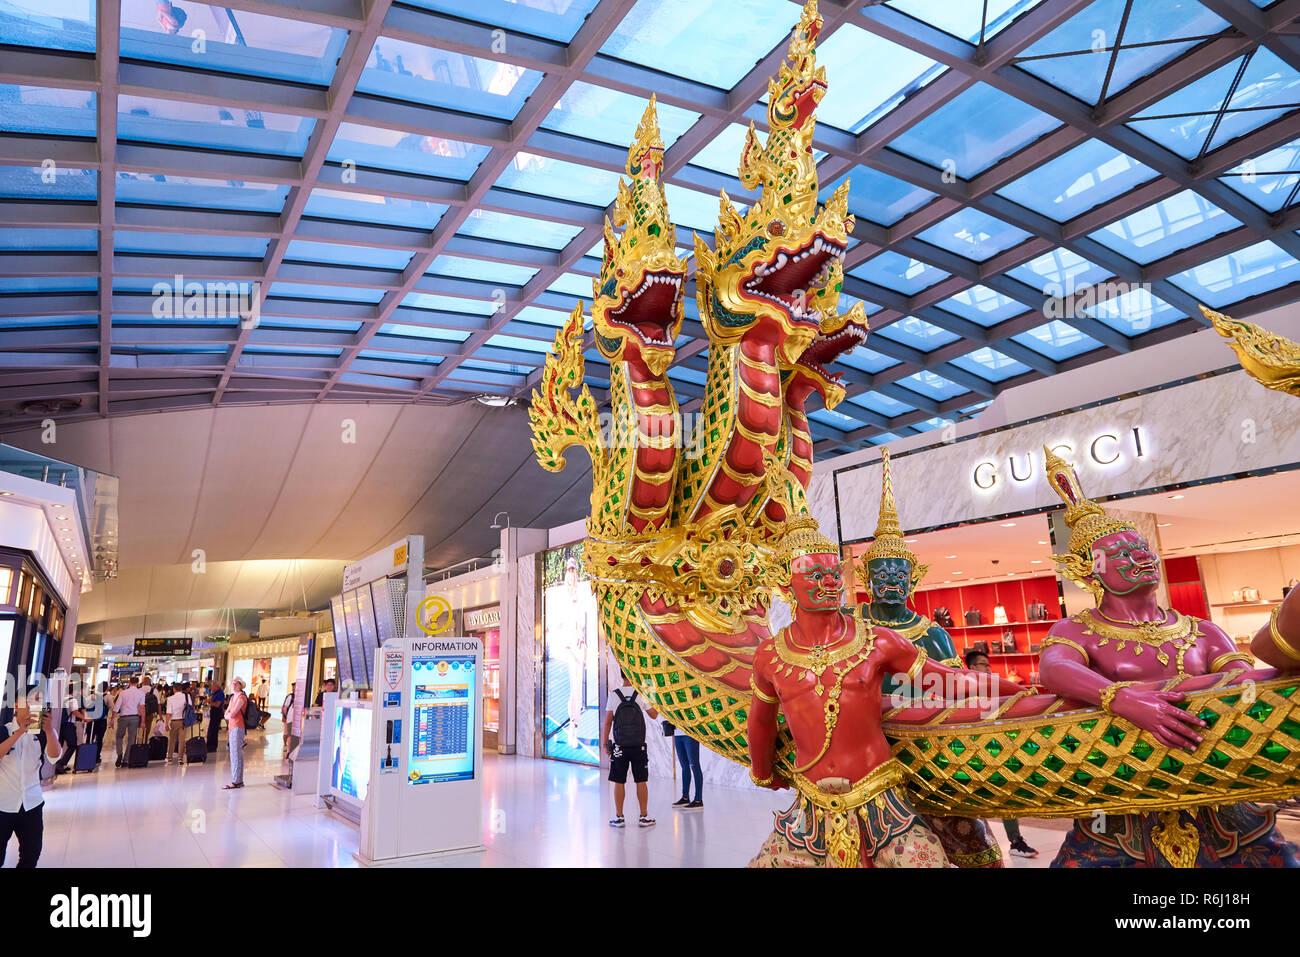 Statues representing the Hindu Churning of the Milk story in Suvarnabhumi Airport lobby in Bangkok, Thailand. Stock Photo